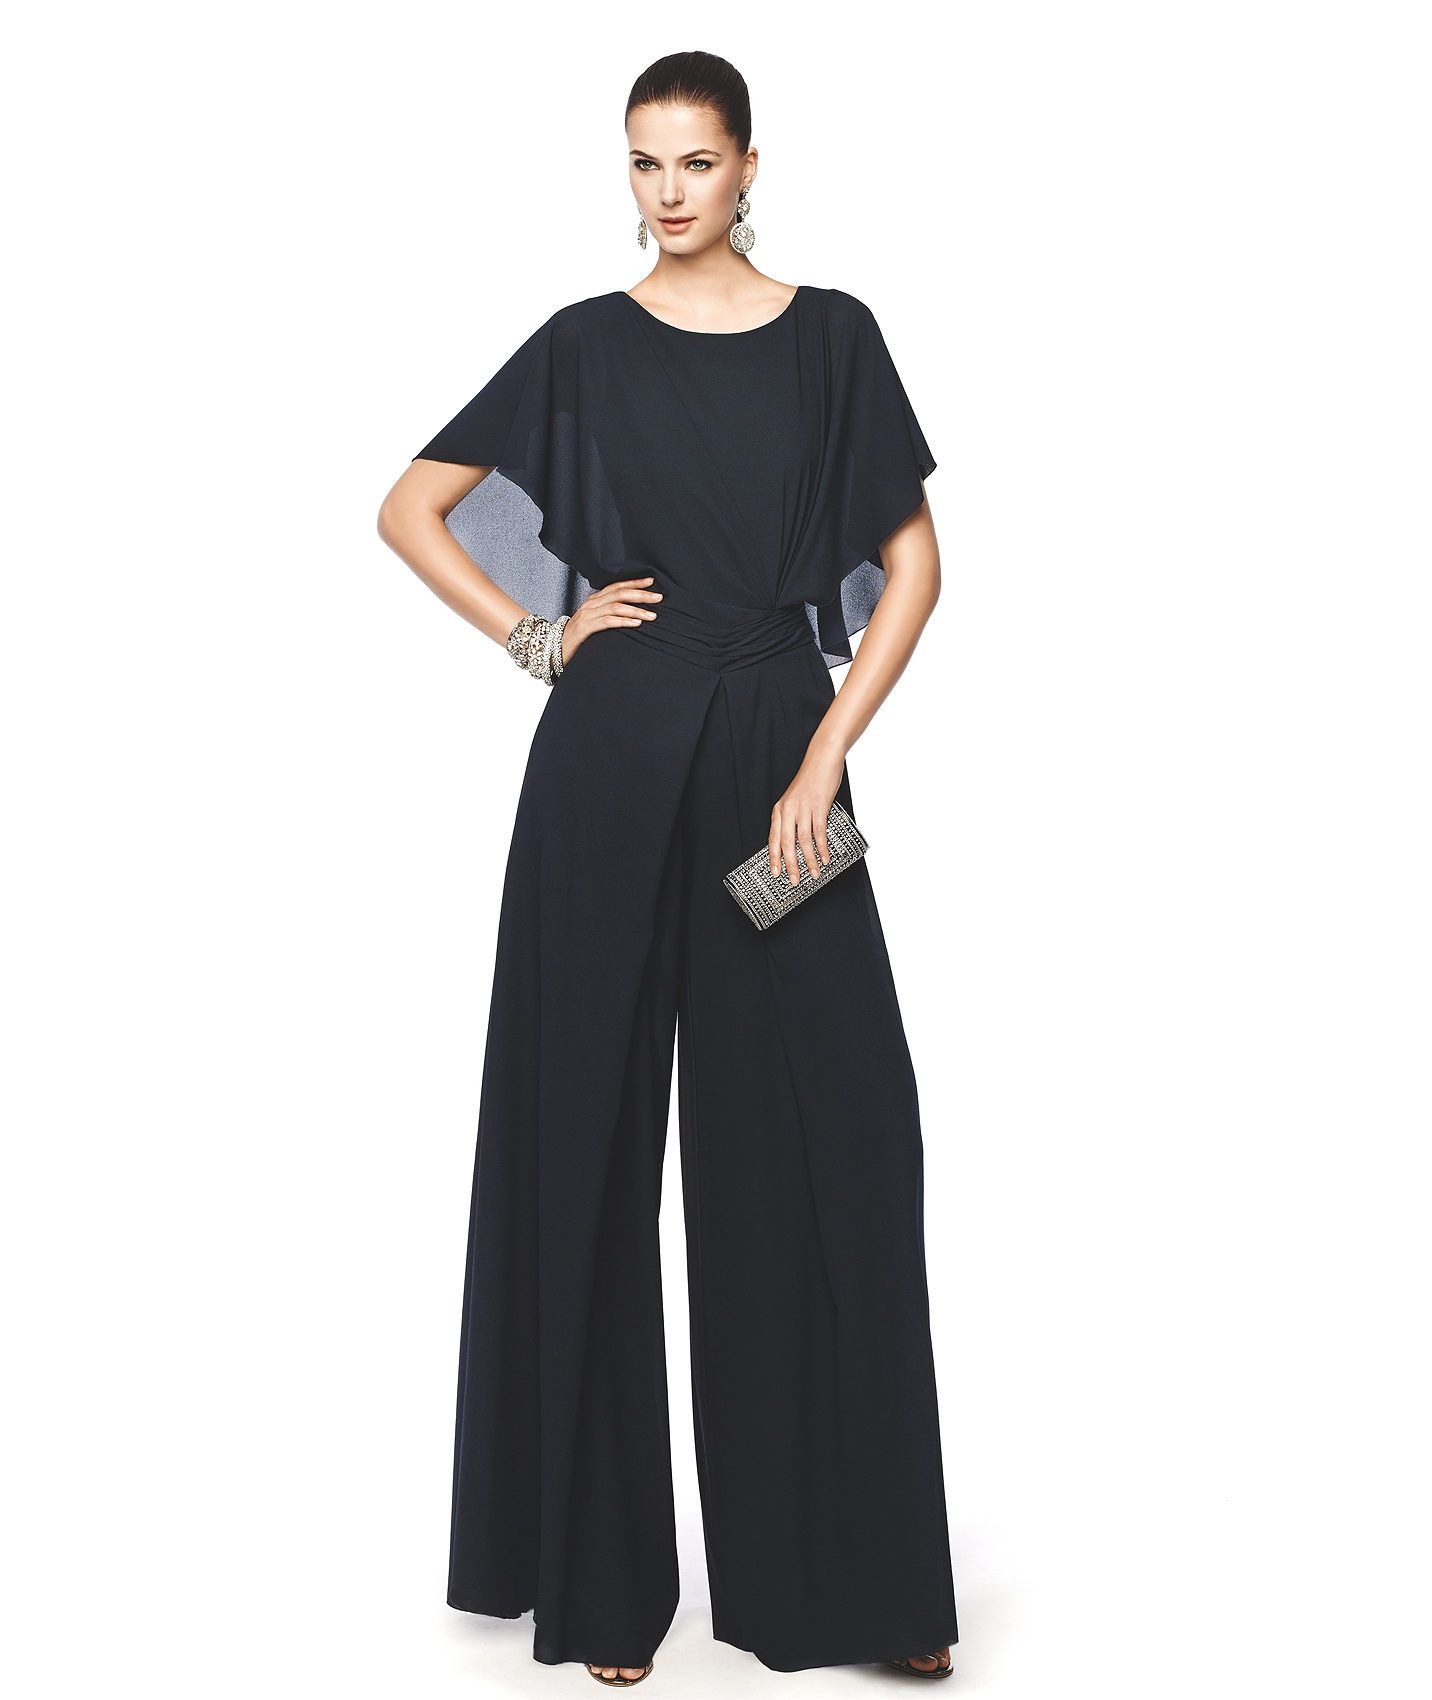 Combinado de fiesta negro con escote redondo y pantalón largo Modelo